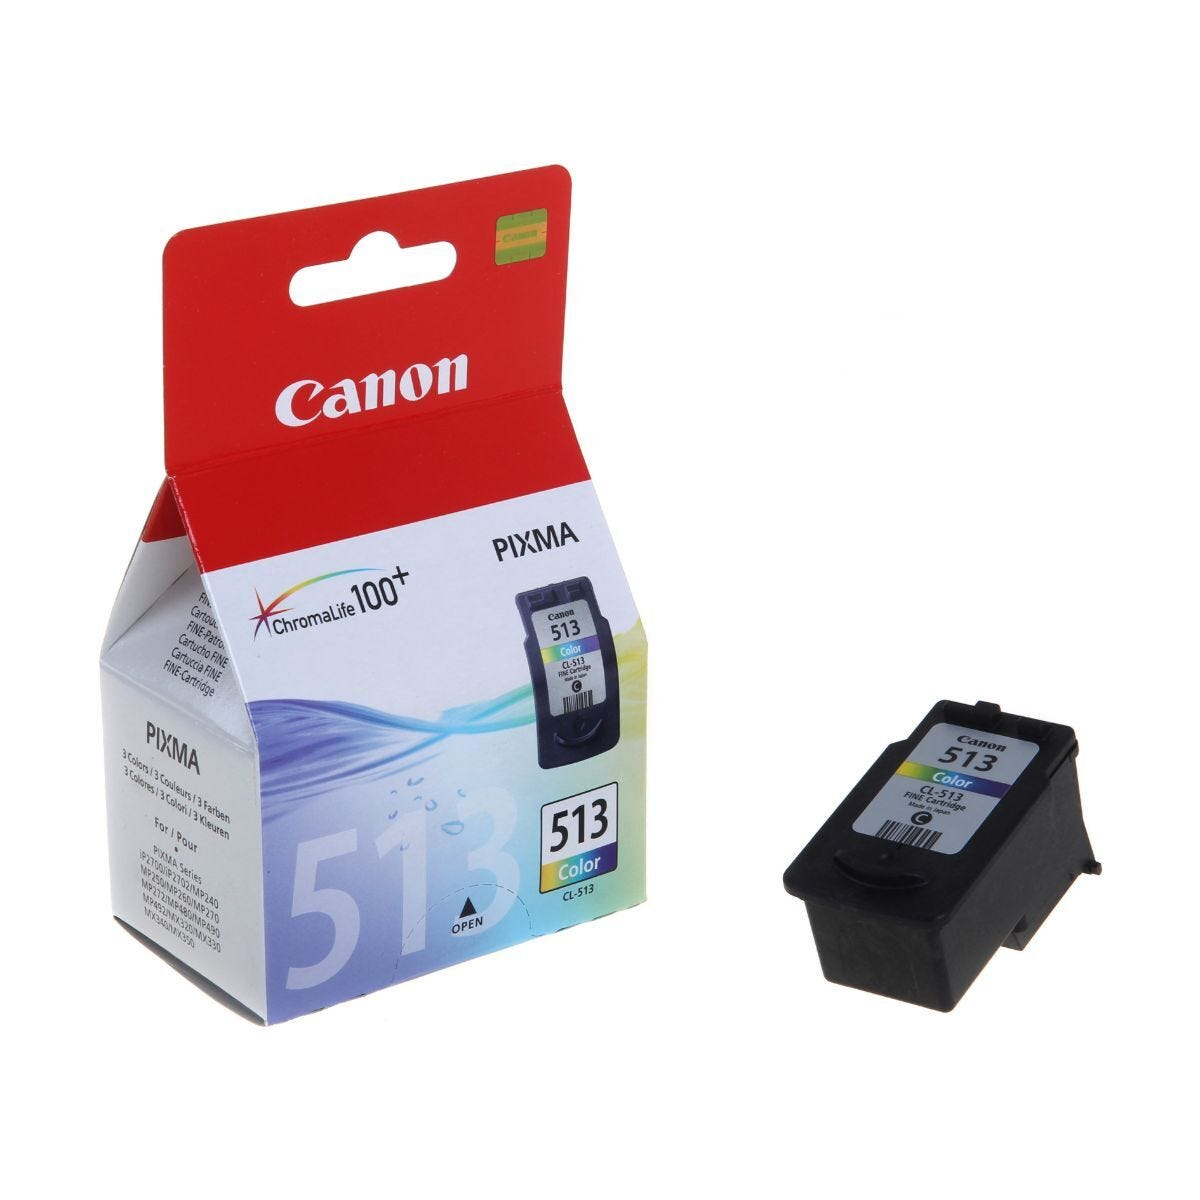 Canon CL-513 Colour Ink Cartridge